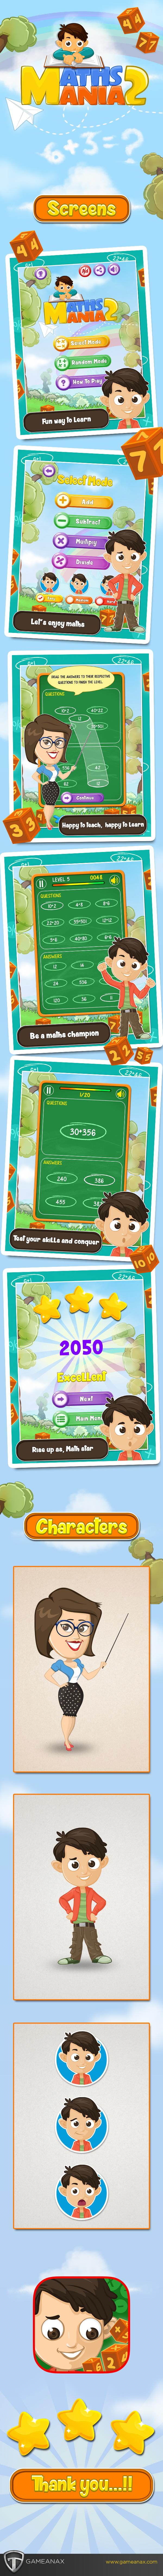 gamedesign art uidesign mobilegames maths kids characters